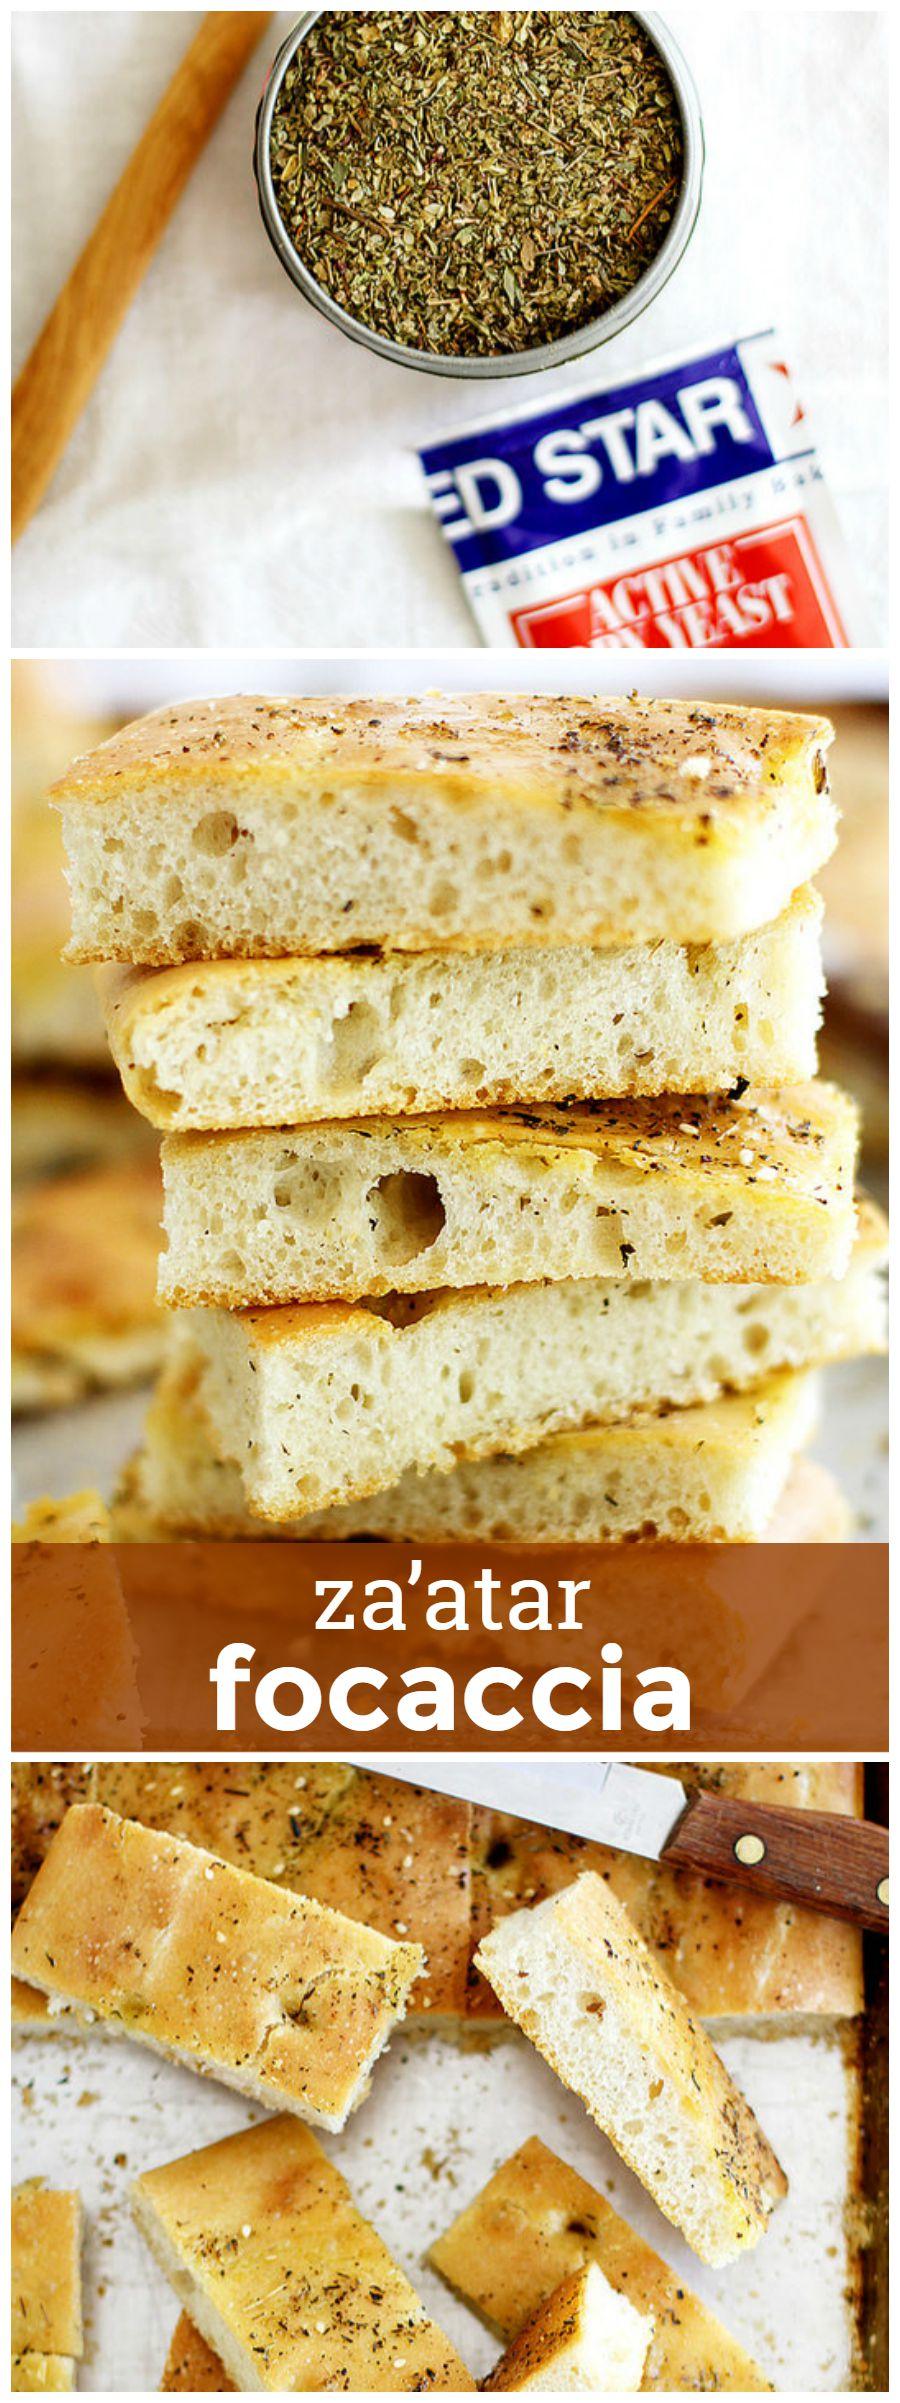 Za'atar Focaccia -- Tender focaccia flavored with savory za'atar spices. girlversusdough.com @girlversusdough